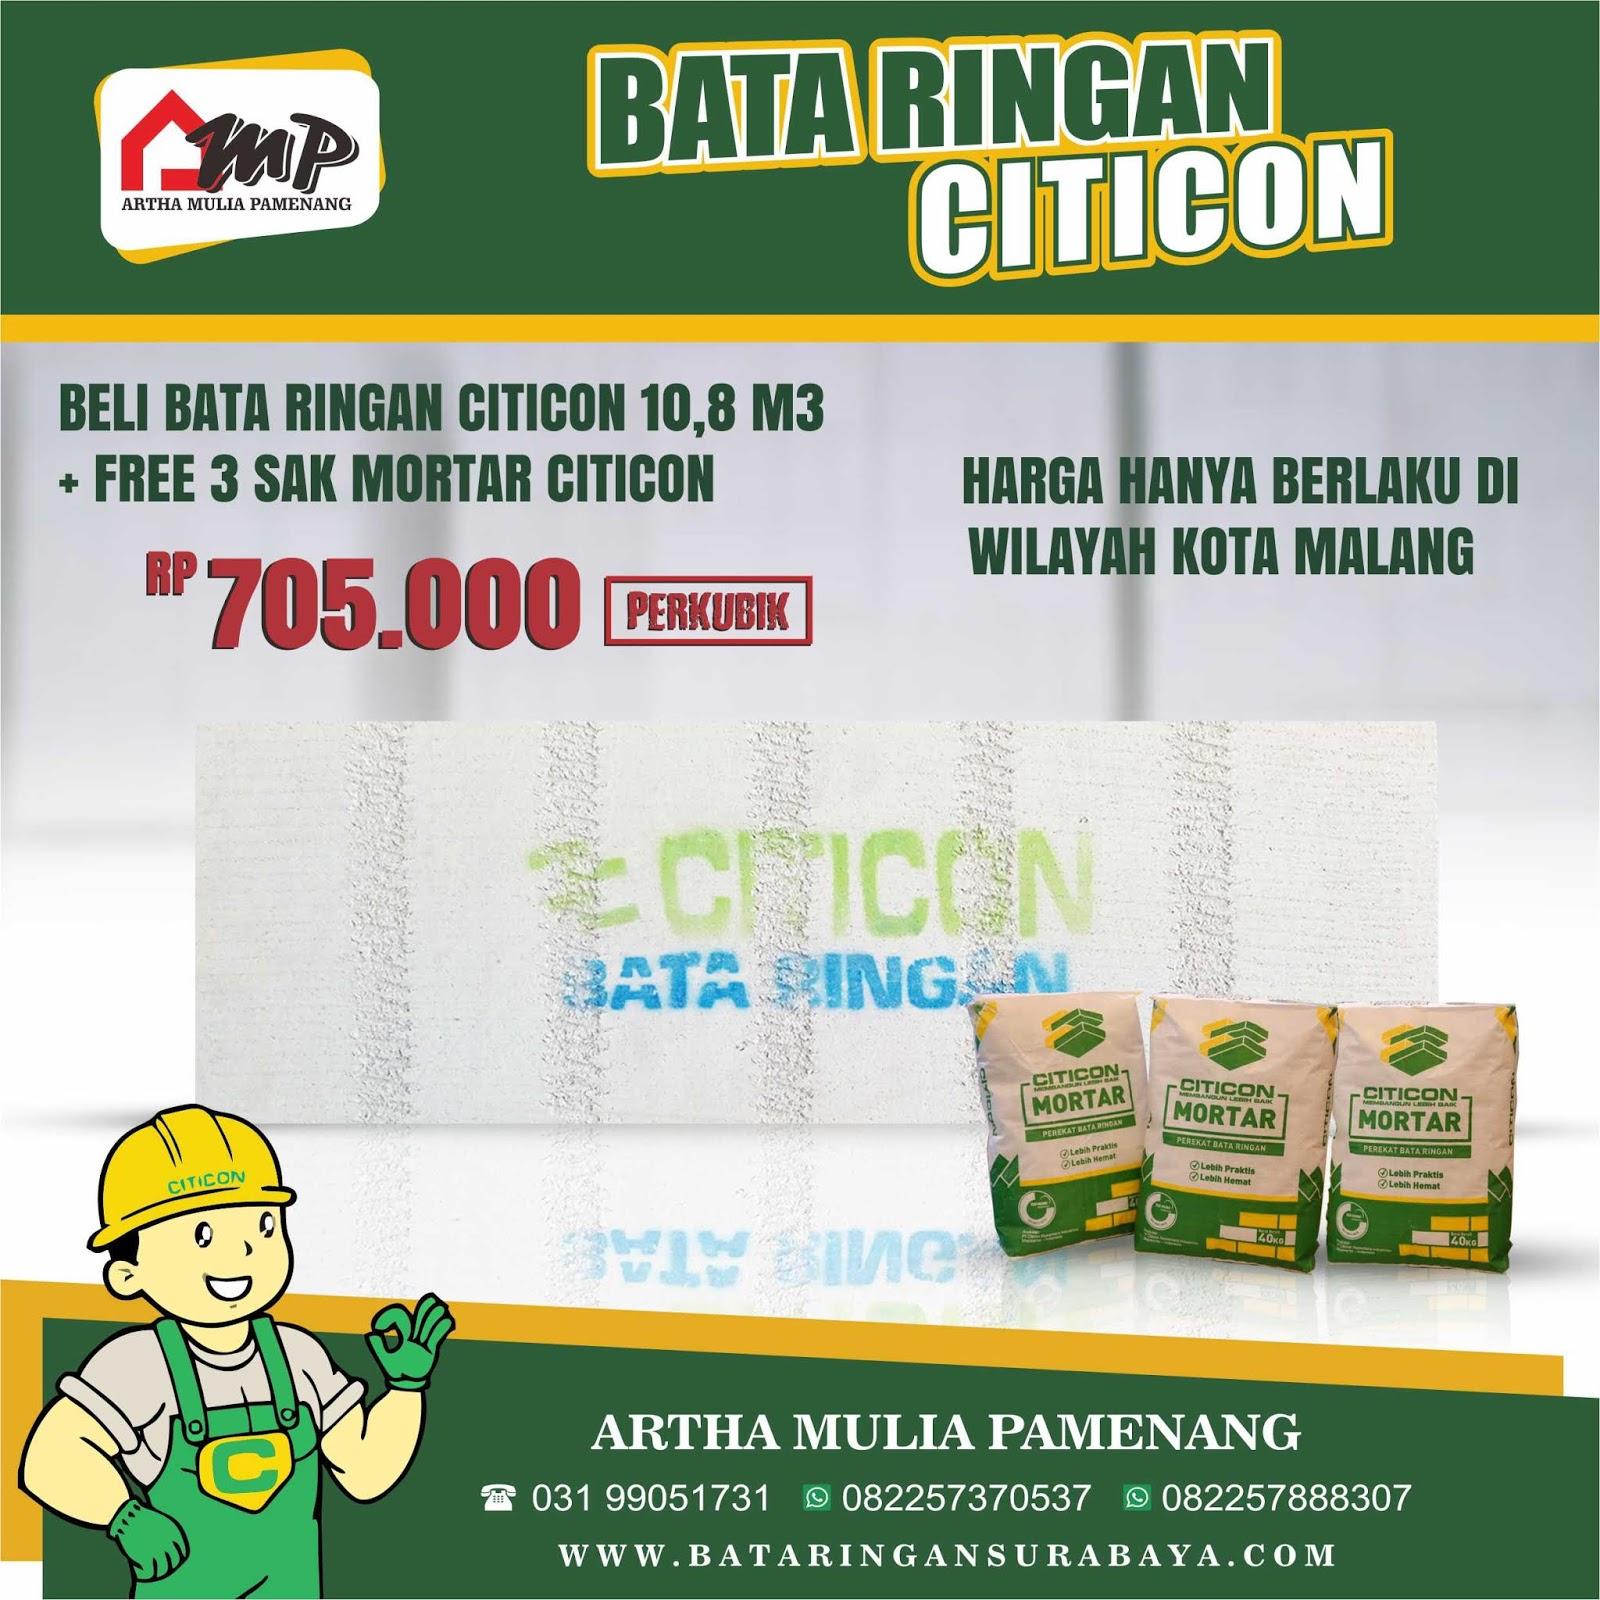 Jual Bata Ringan Malang, Informasi Terbaru Harga Bata Ringan Malang 2019